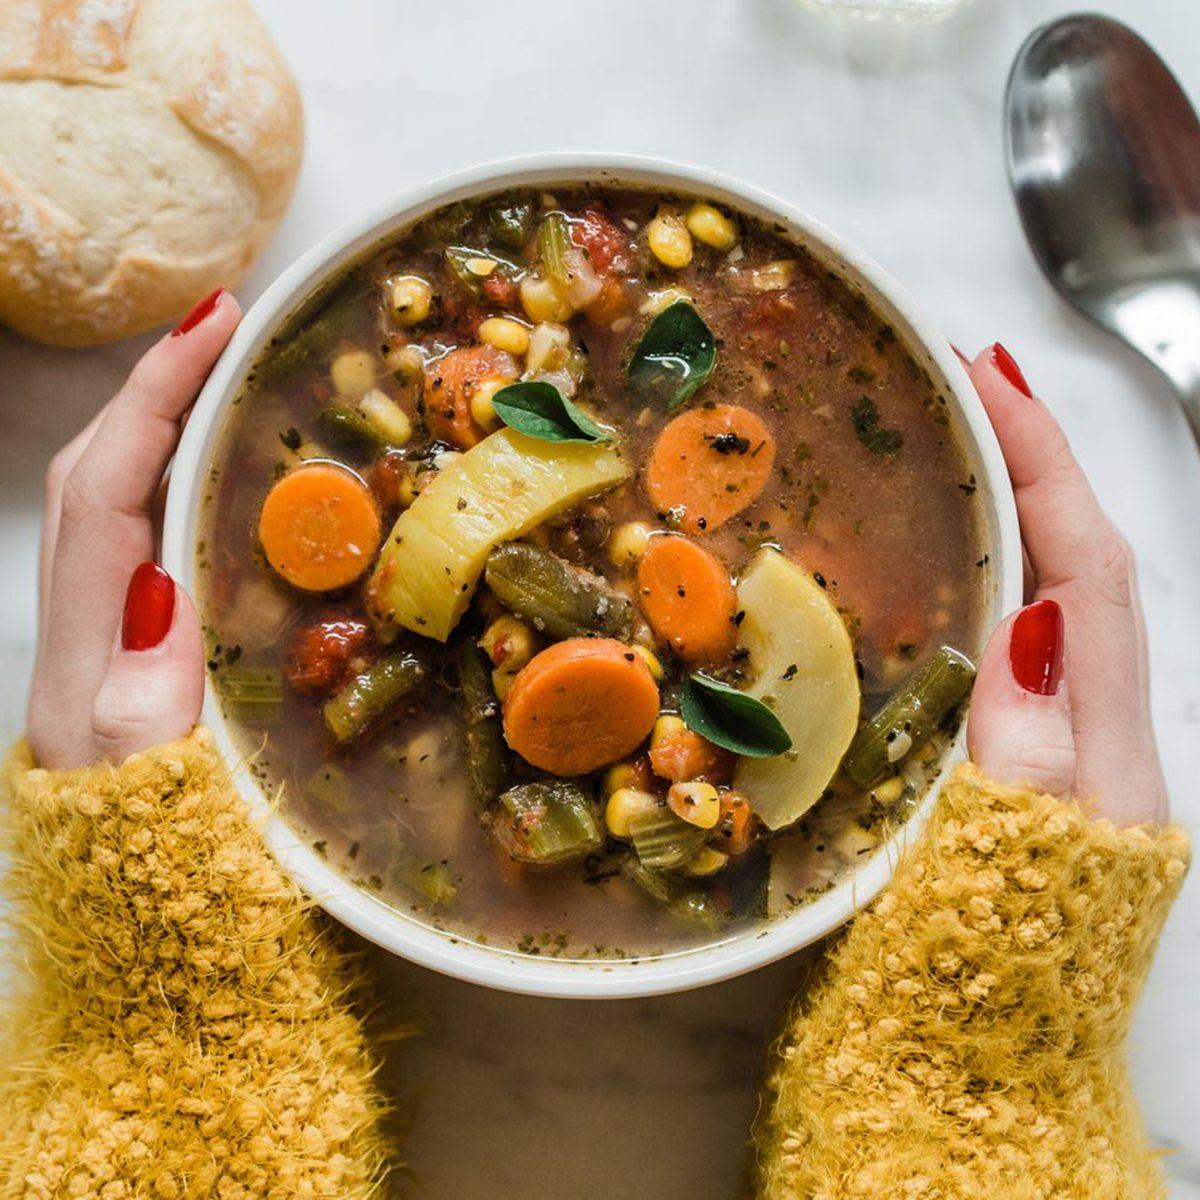 Spoonful of Comfort Harvest Vegetable Soup